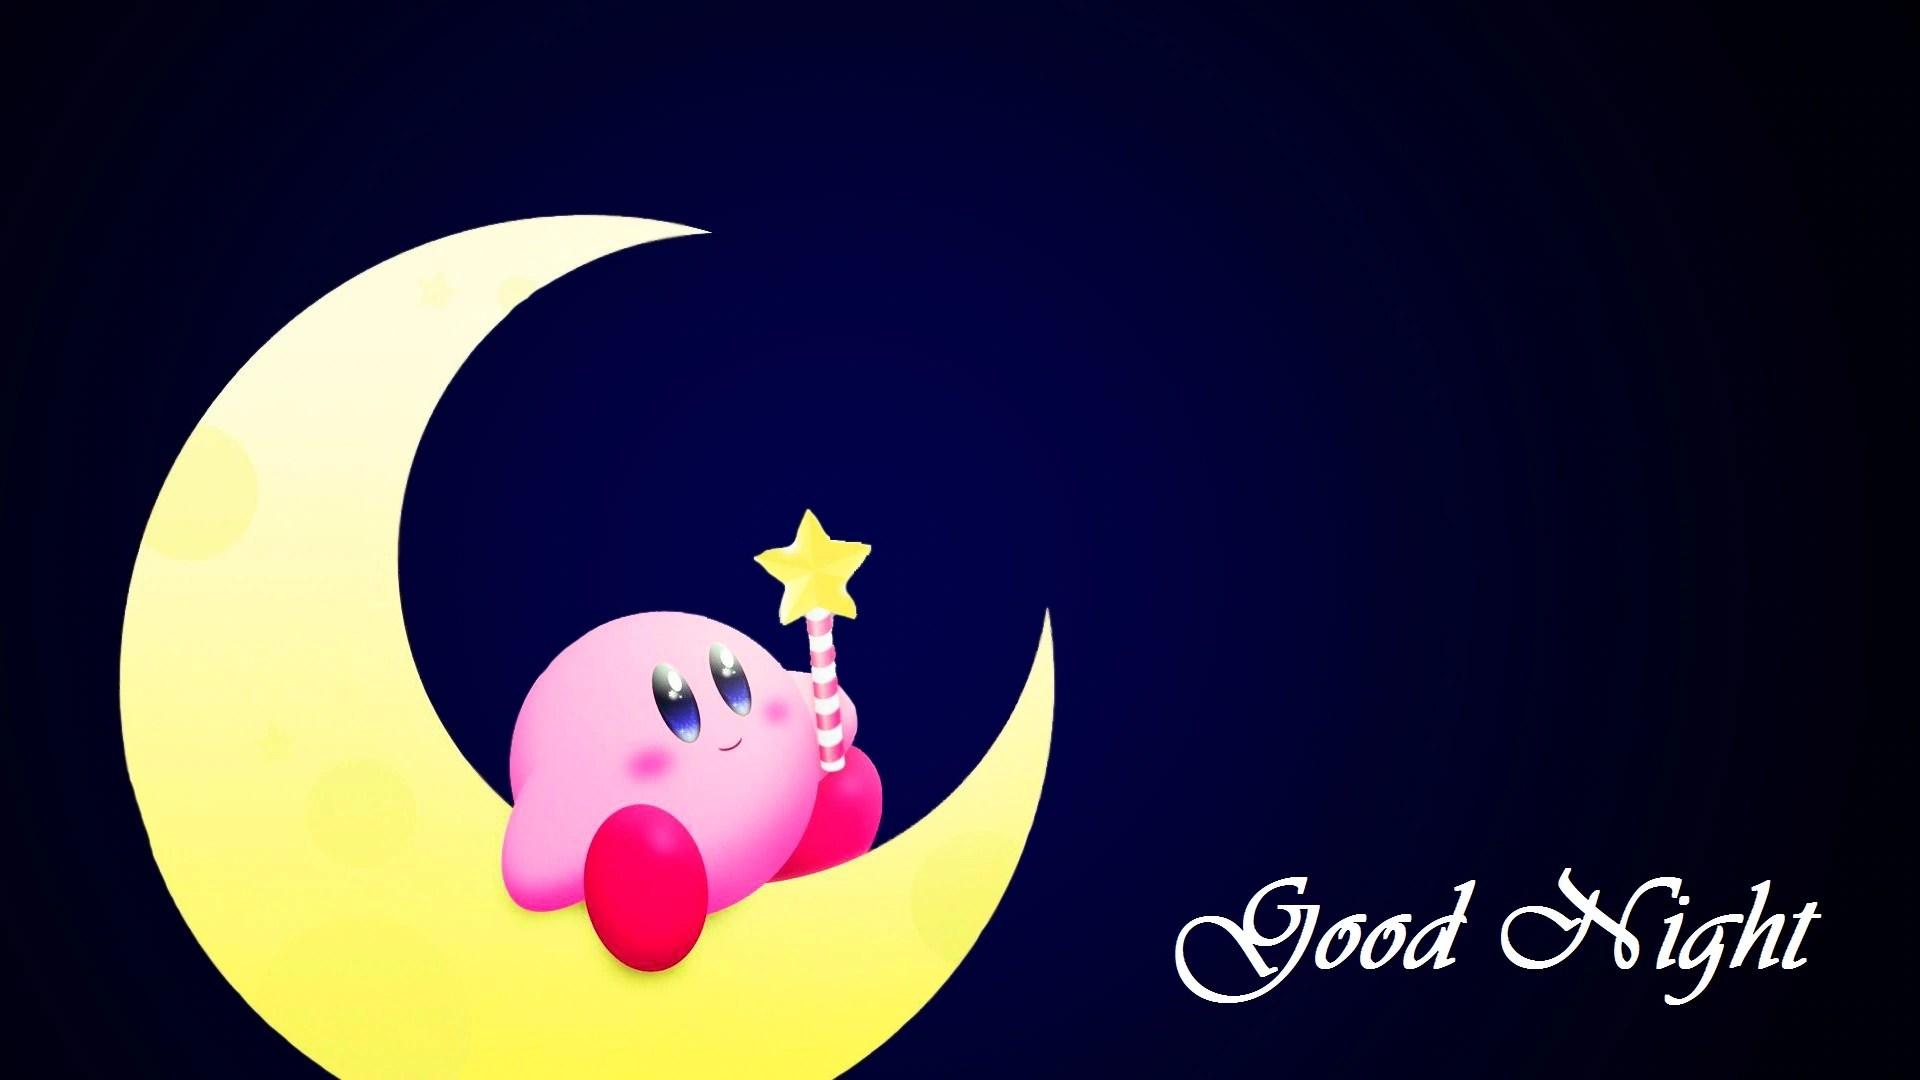 good night cute moon pink image